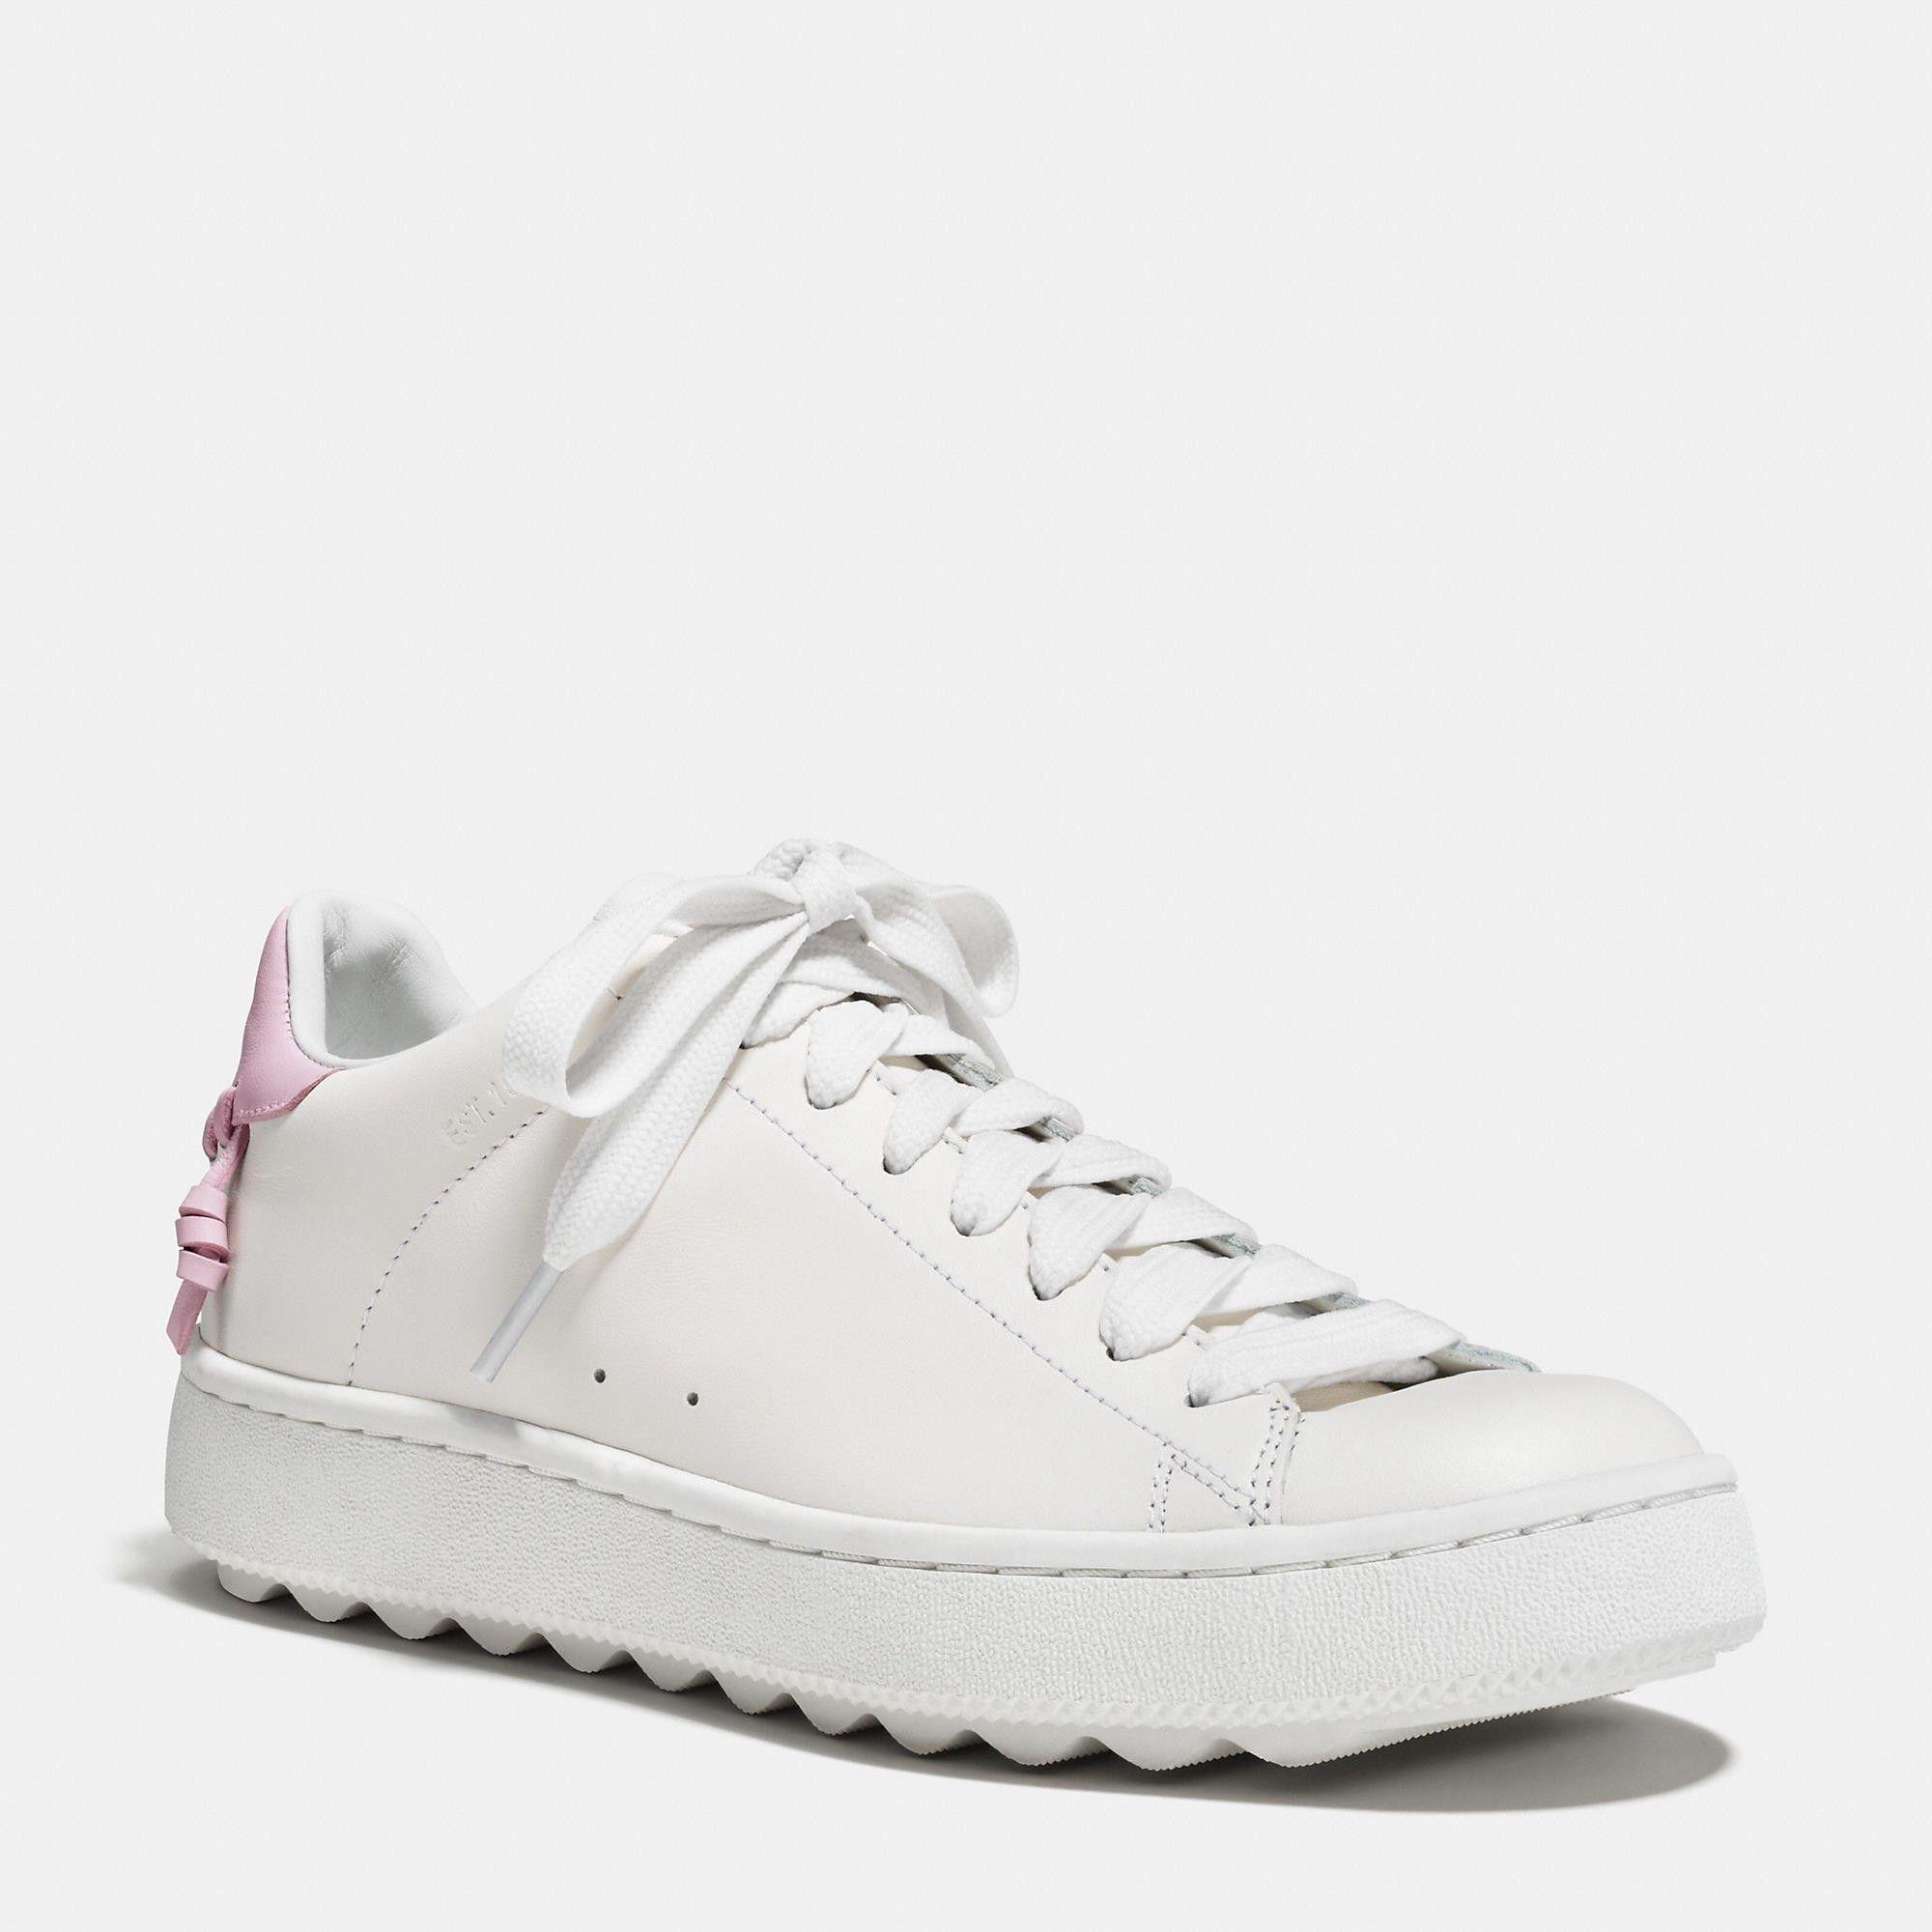 Chaussures - Bas-tops Et Chaussures De Sport Obtiennent 6pFjuKDRg9